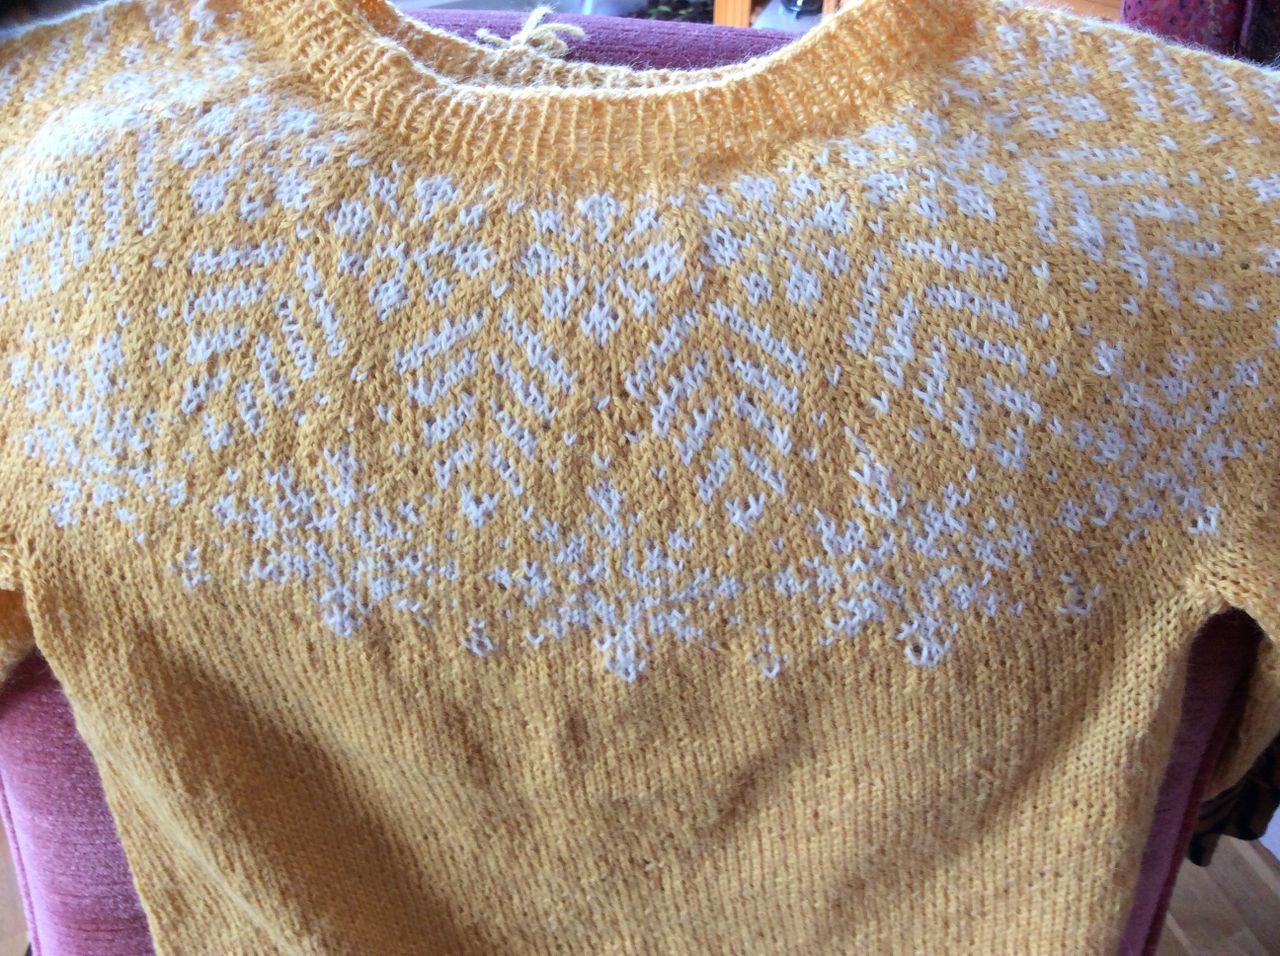 Lilla genser med sentral modell | Senpolia håndlaget